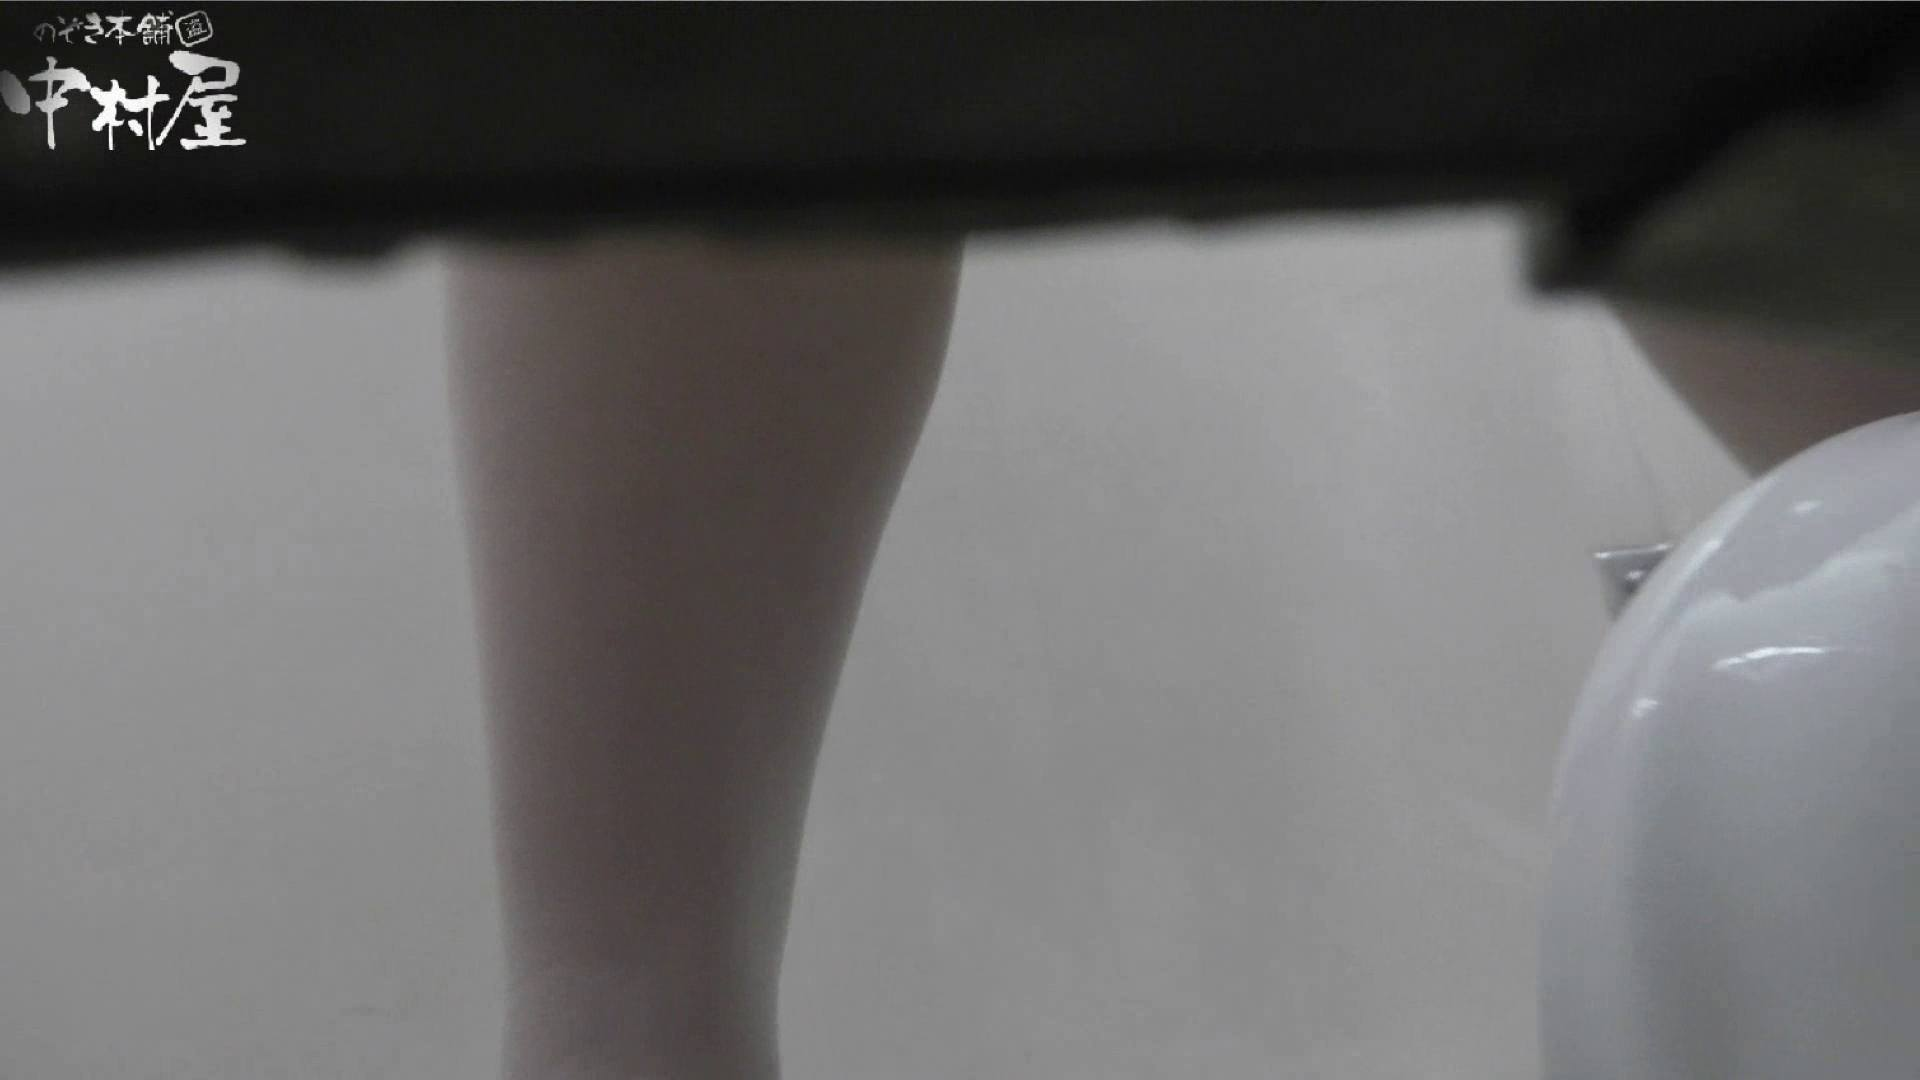 vol.32 命がけ潜伏洗面所! ポニテのケツ毛 OLハメ撮り  41Pix 10